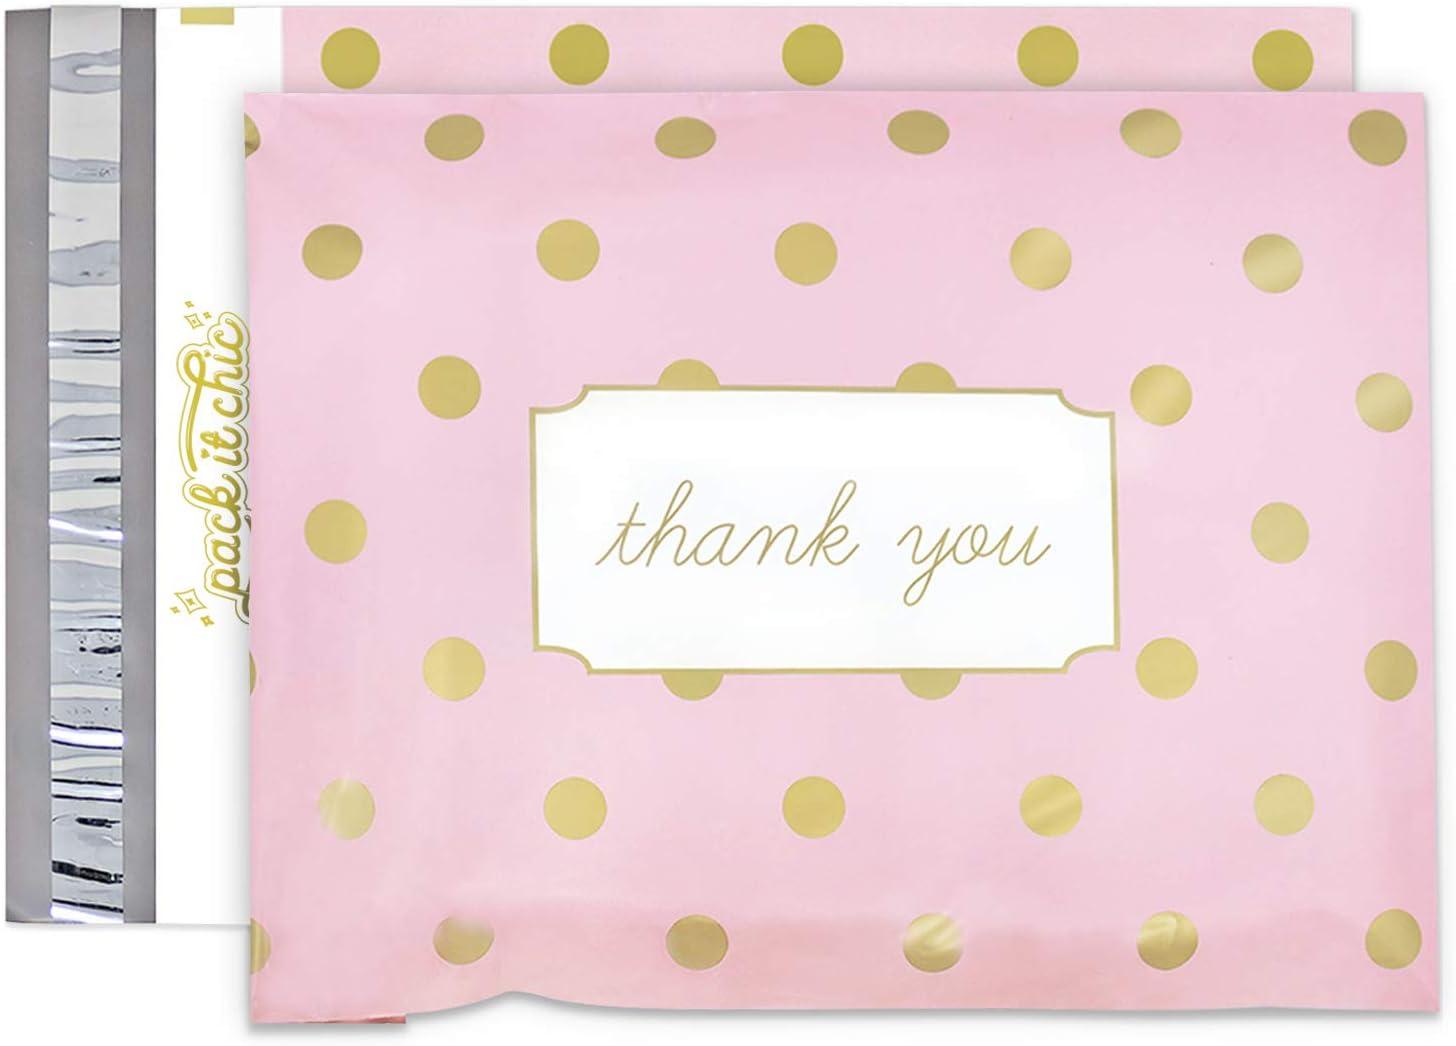 Medium 7 inch by 10 inch zipper Bag Pink Polka Dot